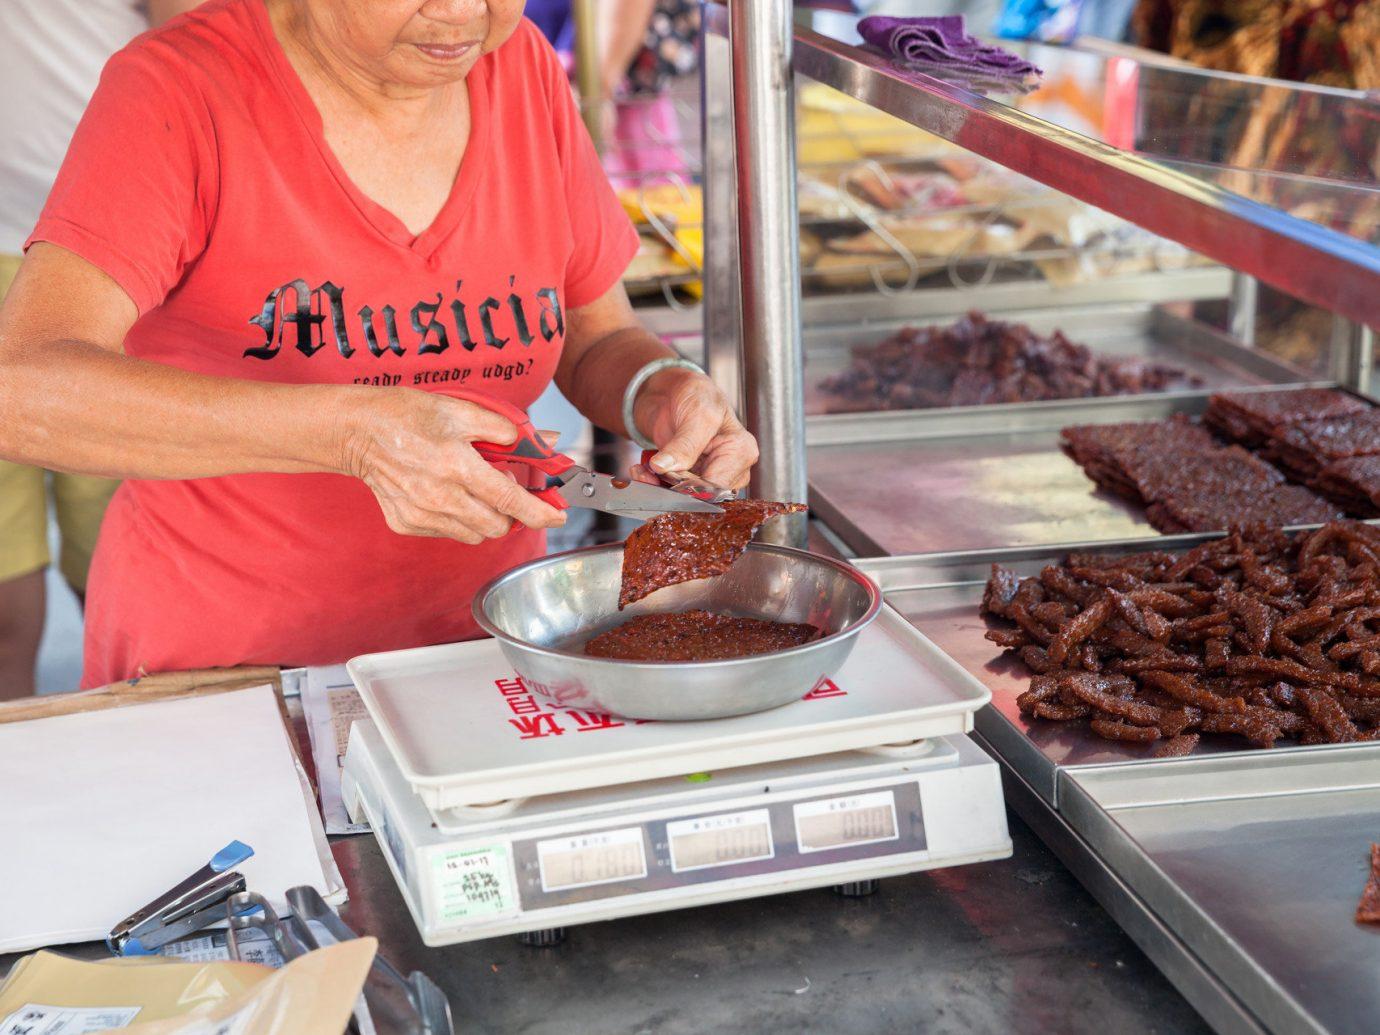 Food + Drink person indoor food vendor meal bakery dessert sense baking preparing baked